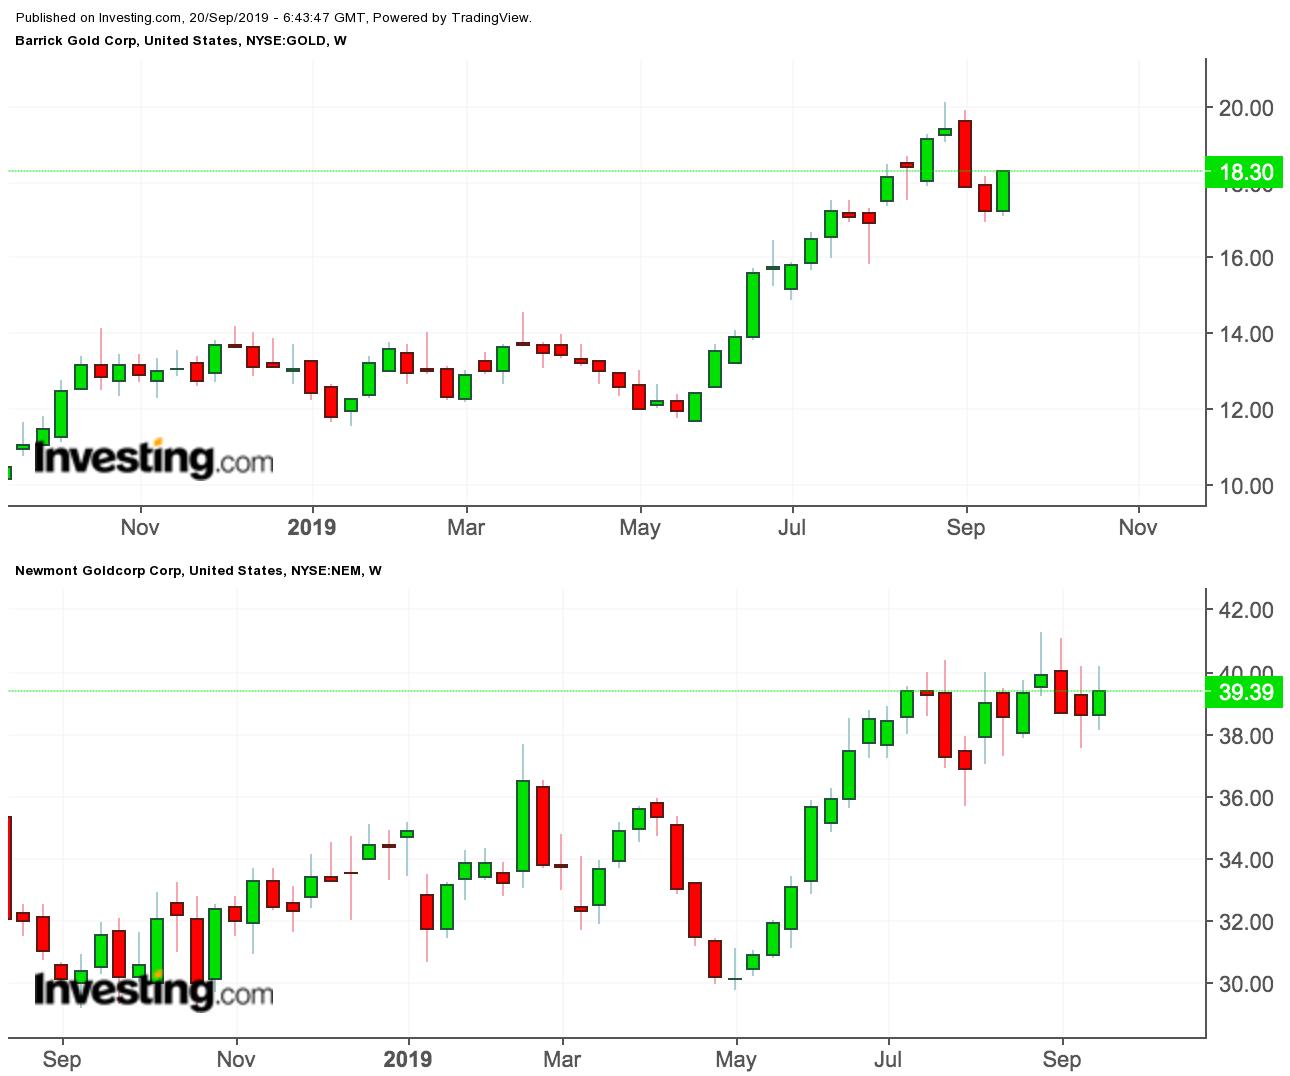 Newmont Goldcorp/Barrick Gold price charts